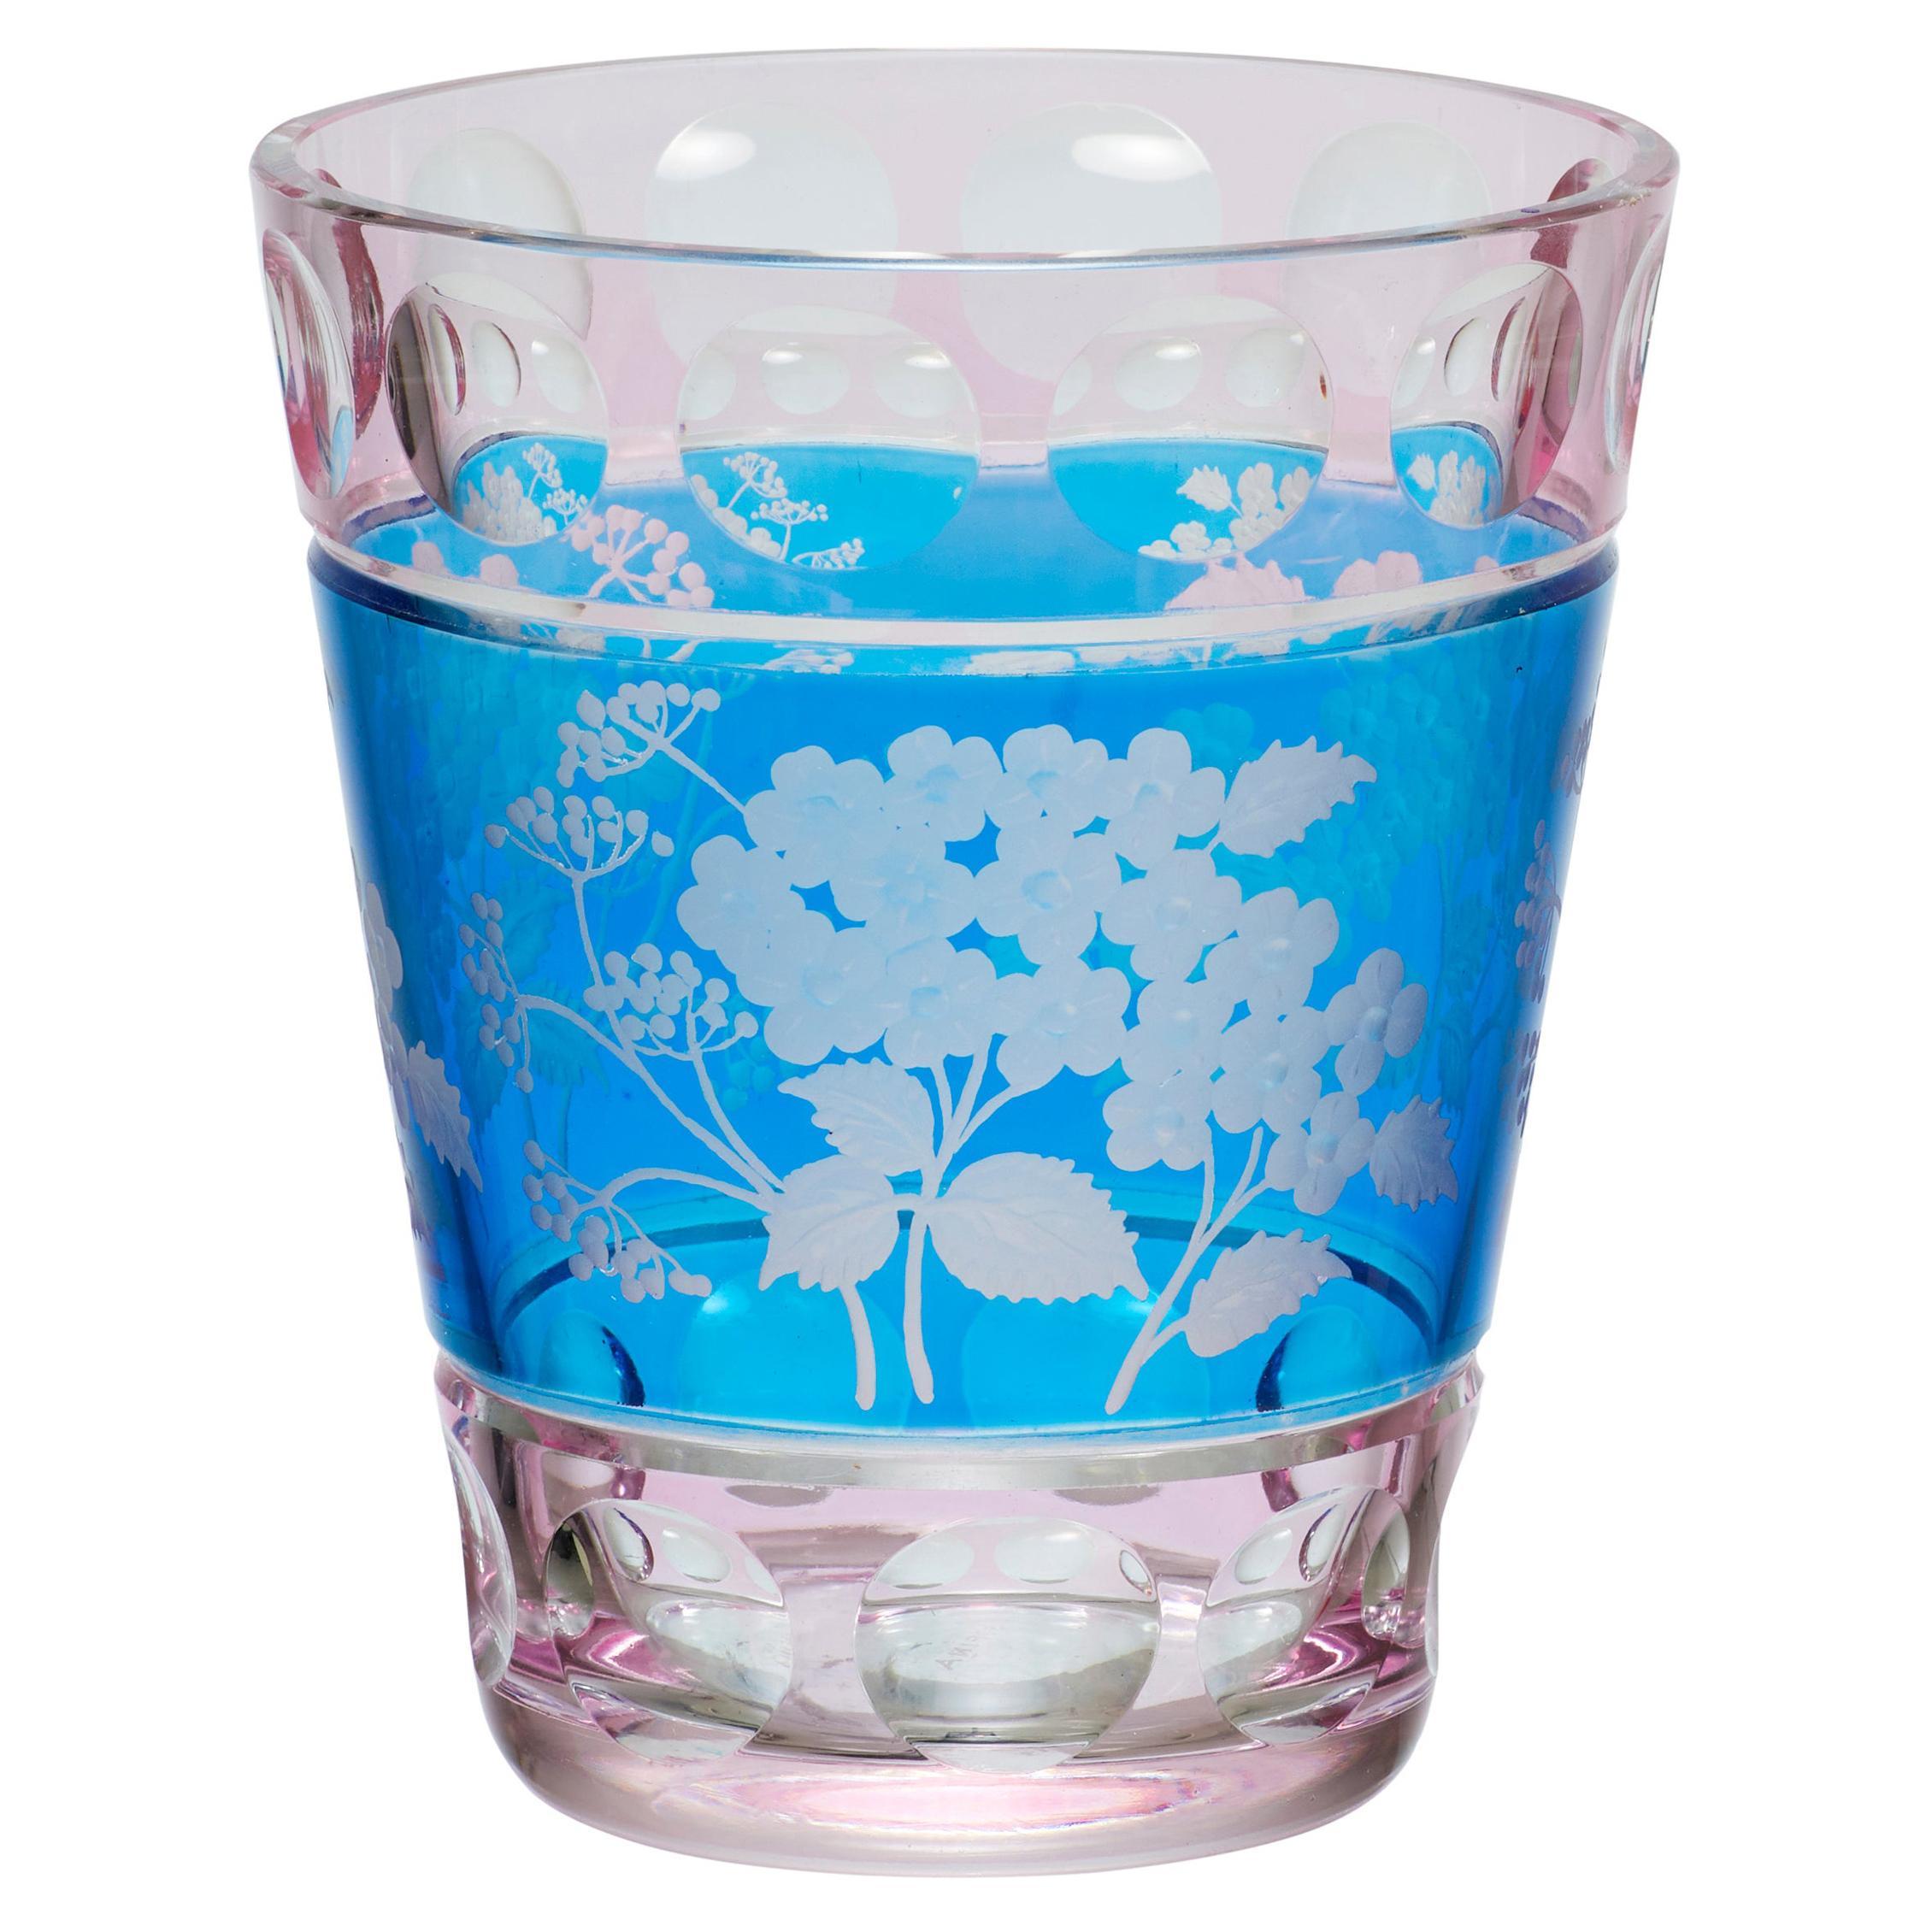 Country Style Vase Hand Blown Crystal Hydrangea Decor Sofina Boutique Kitzbuehel